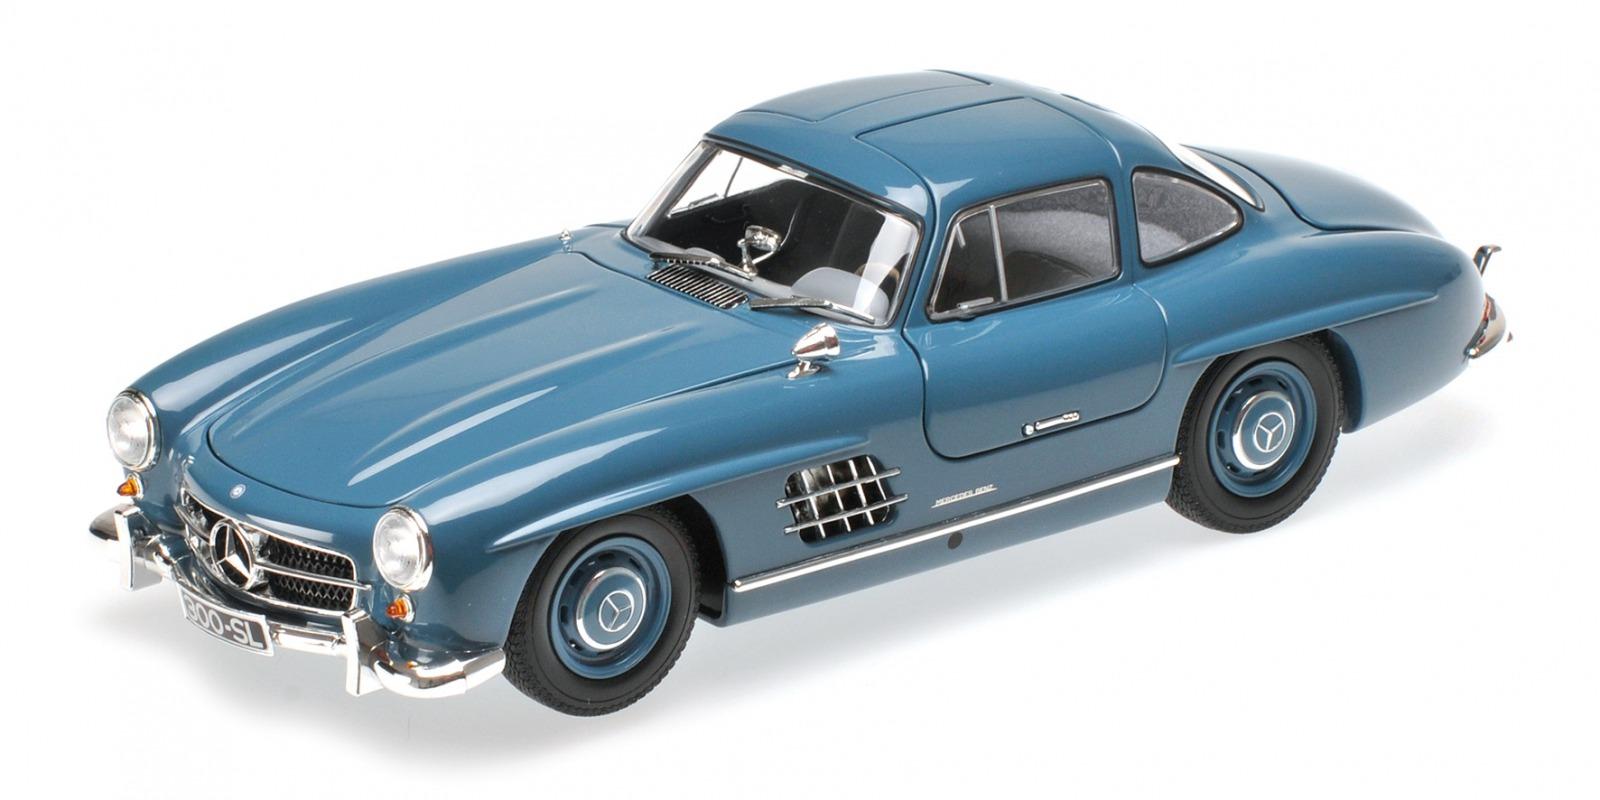 Minichamps ミニチャンプス 1:18 1954 1957年モデル メルセデスベンツ 300 SL1954 1957 Mercedes Benz 300 SL 1/18 by Minichamps